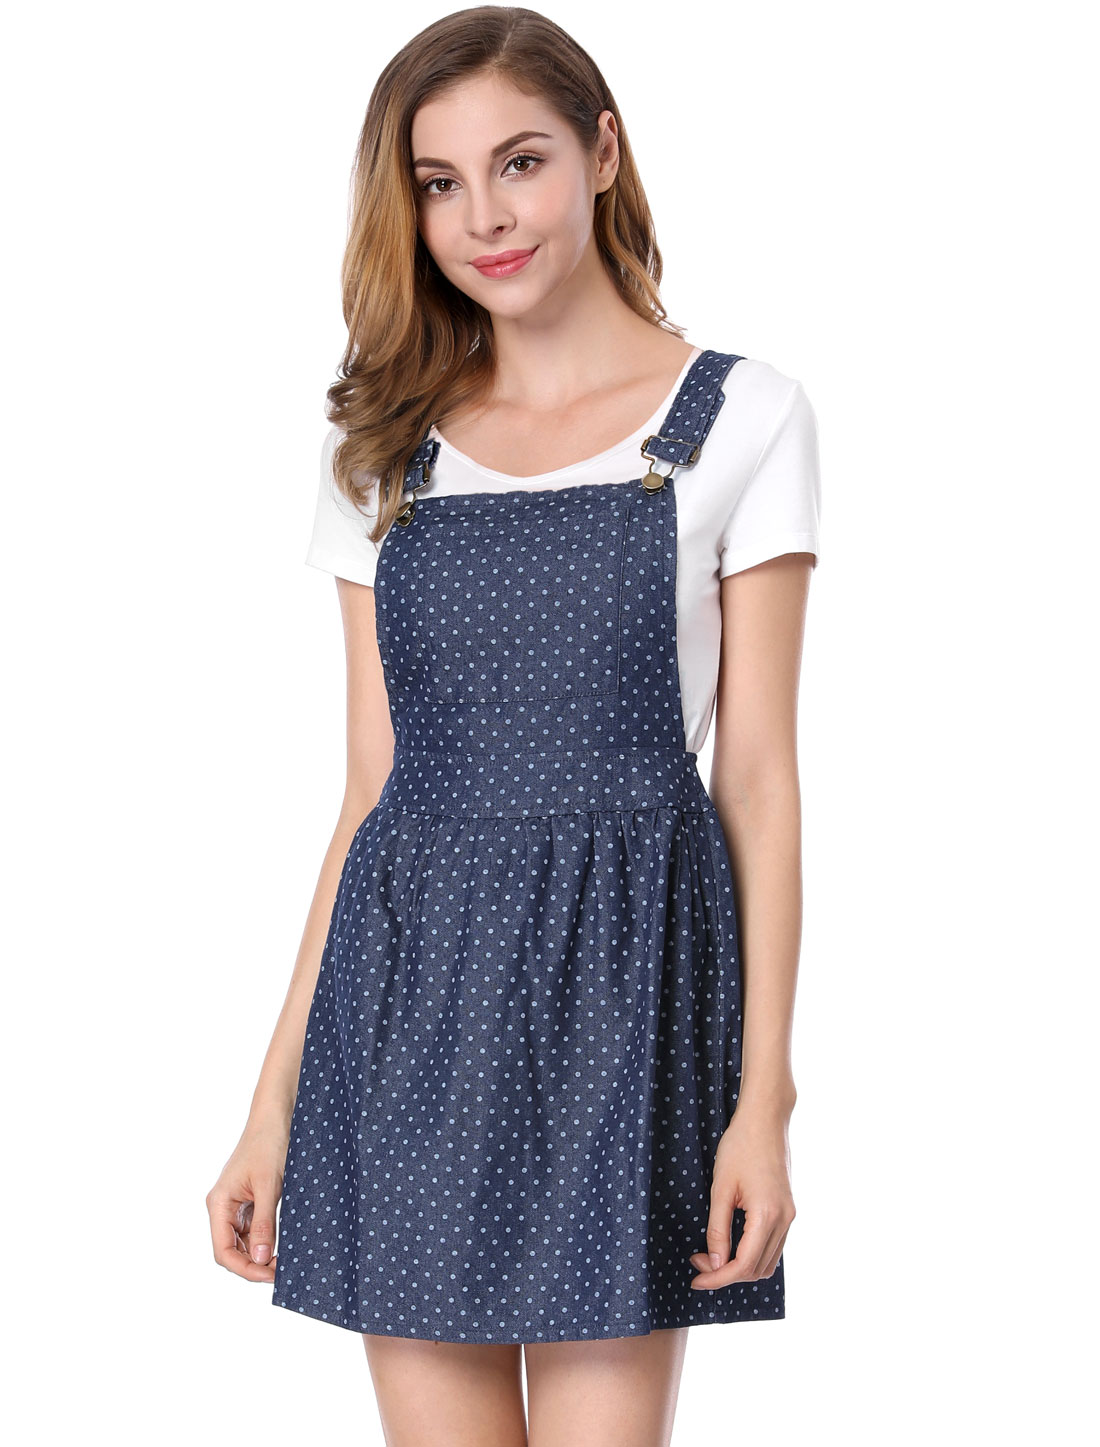 Women Dots Print Adjustable Shoulder Straps Denim Overall Dress Dark Blue XS